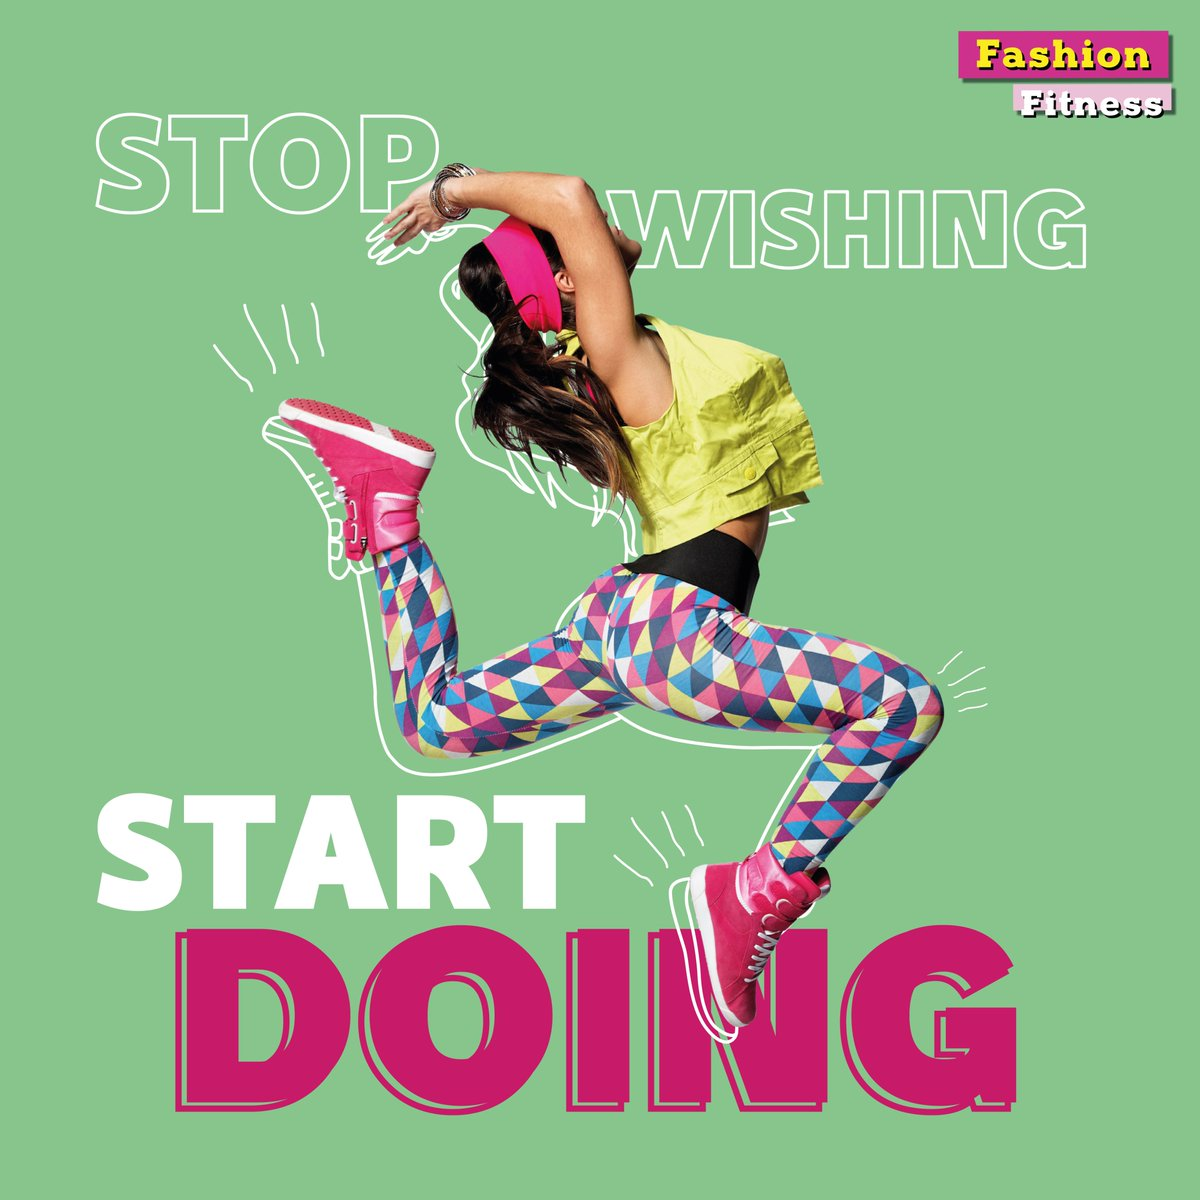 STOP WISHING, START DOING! Functional & fashionable fitness essentials now available in-stores and online.  توقف عن التمني وابدأ العمل! أساسيات اللياقة البدنية الوظيفية والعصرية -  متوفرة الآن في محلاتنا وعبر موقعنا الإلكتروني. https://t.co/bQLfU6Pd75